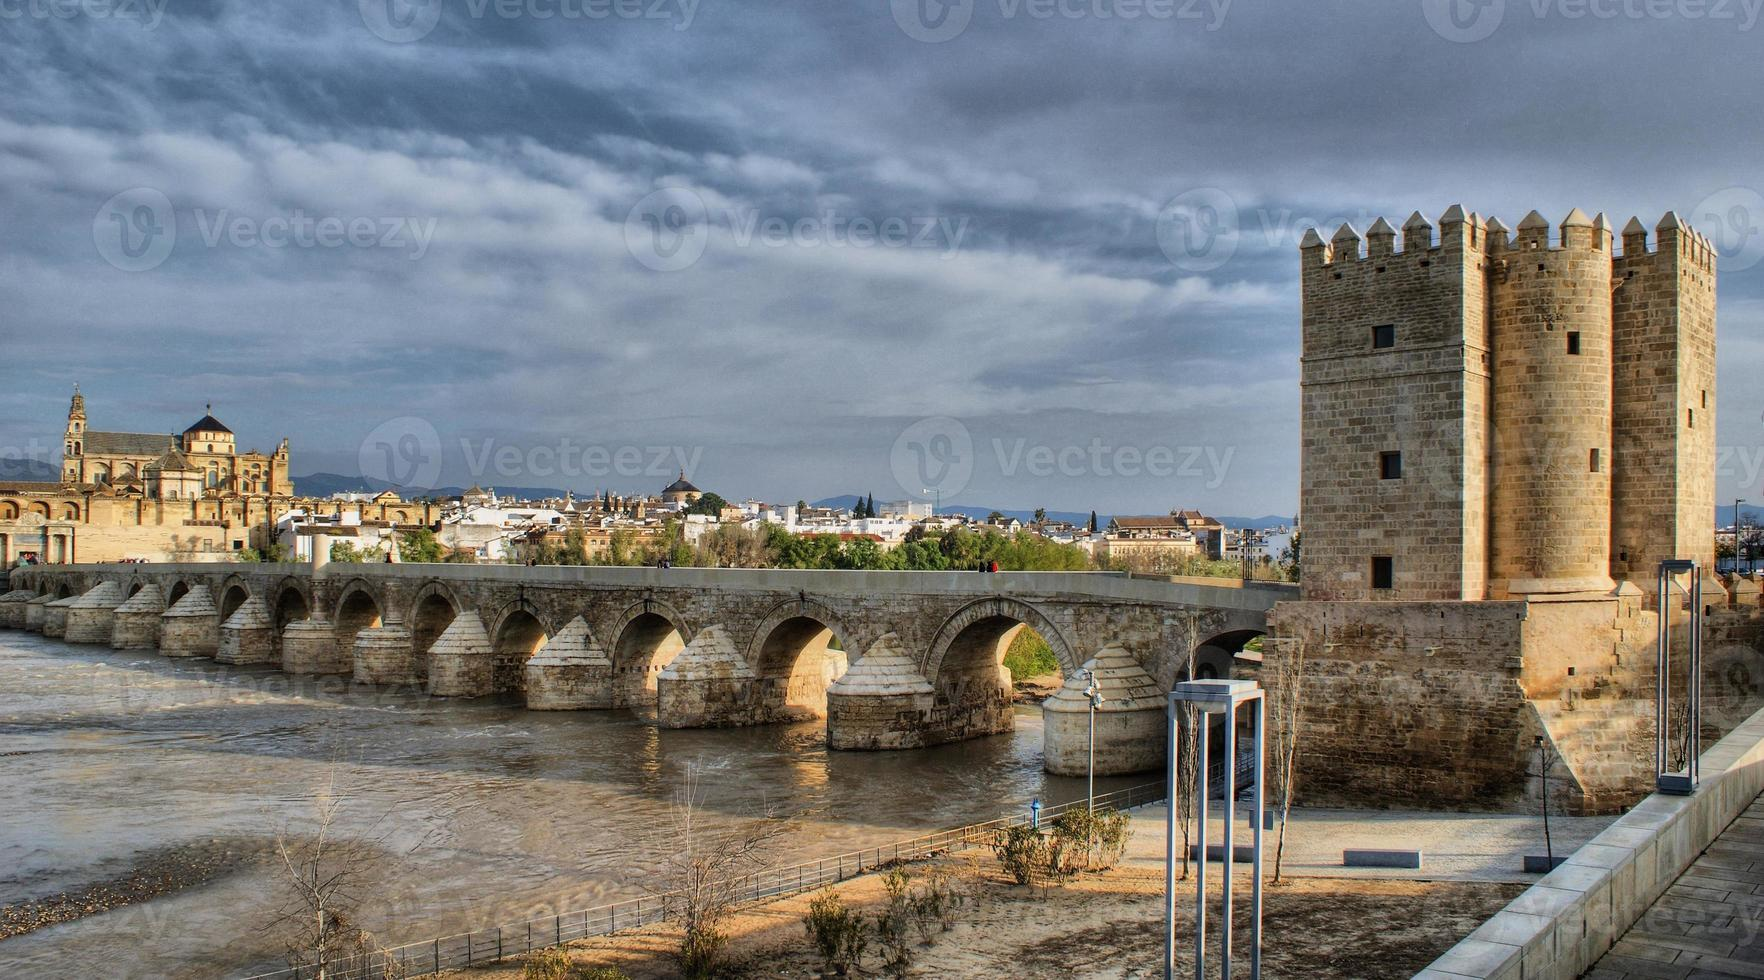 romerska bron i Cordoba foto